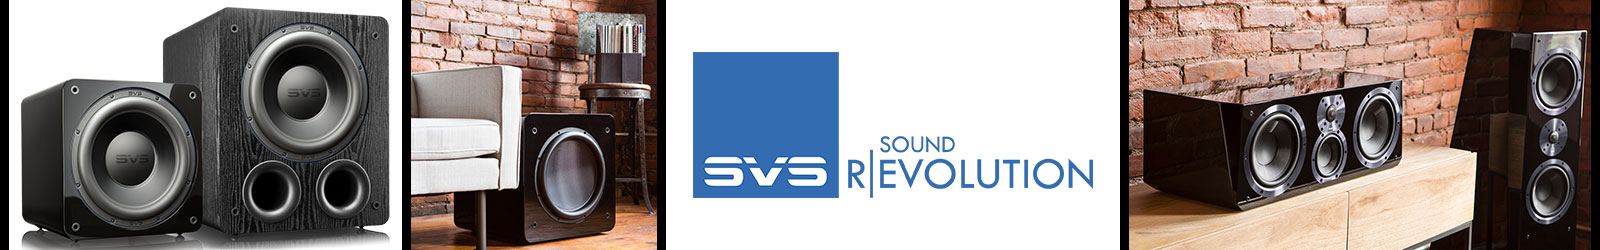 SVS Banner